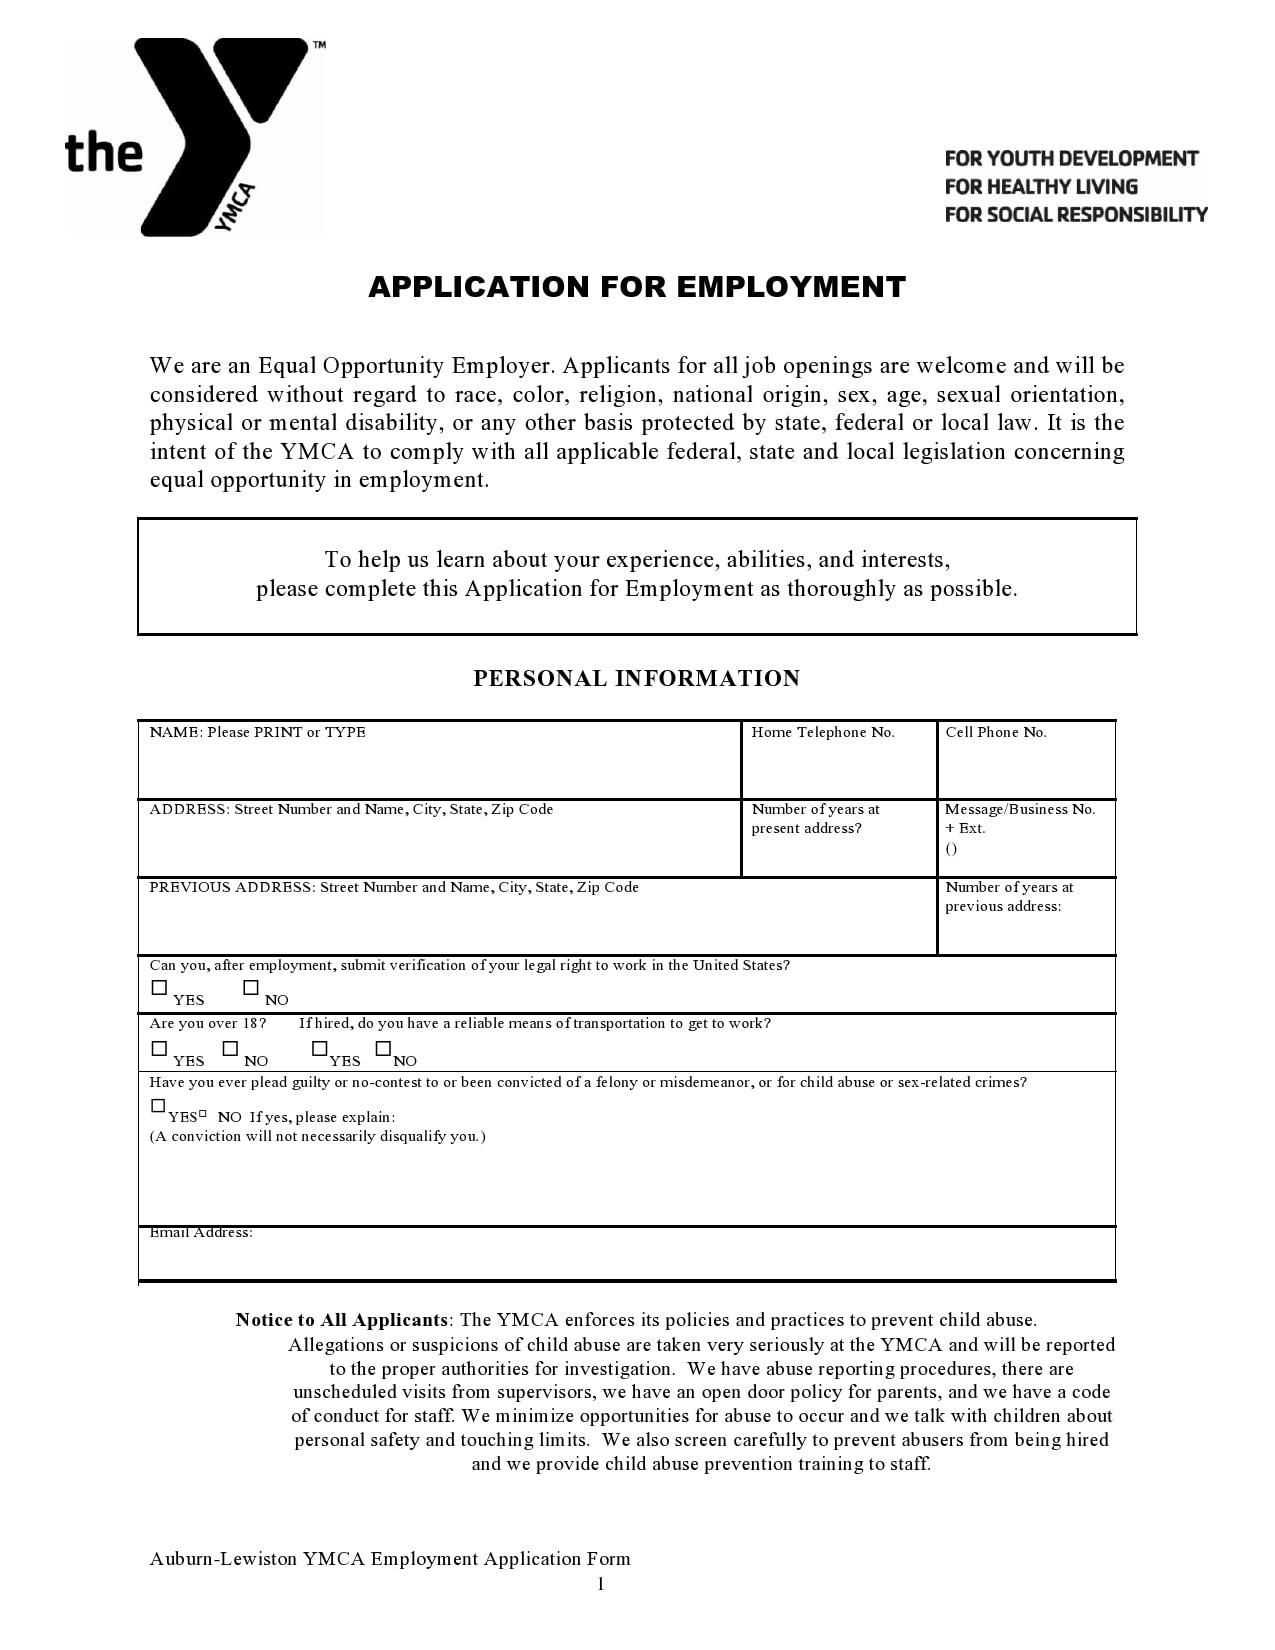 employment application template 20